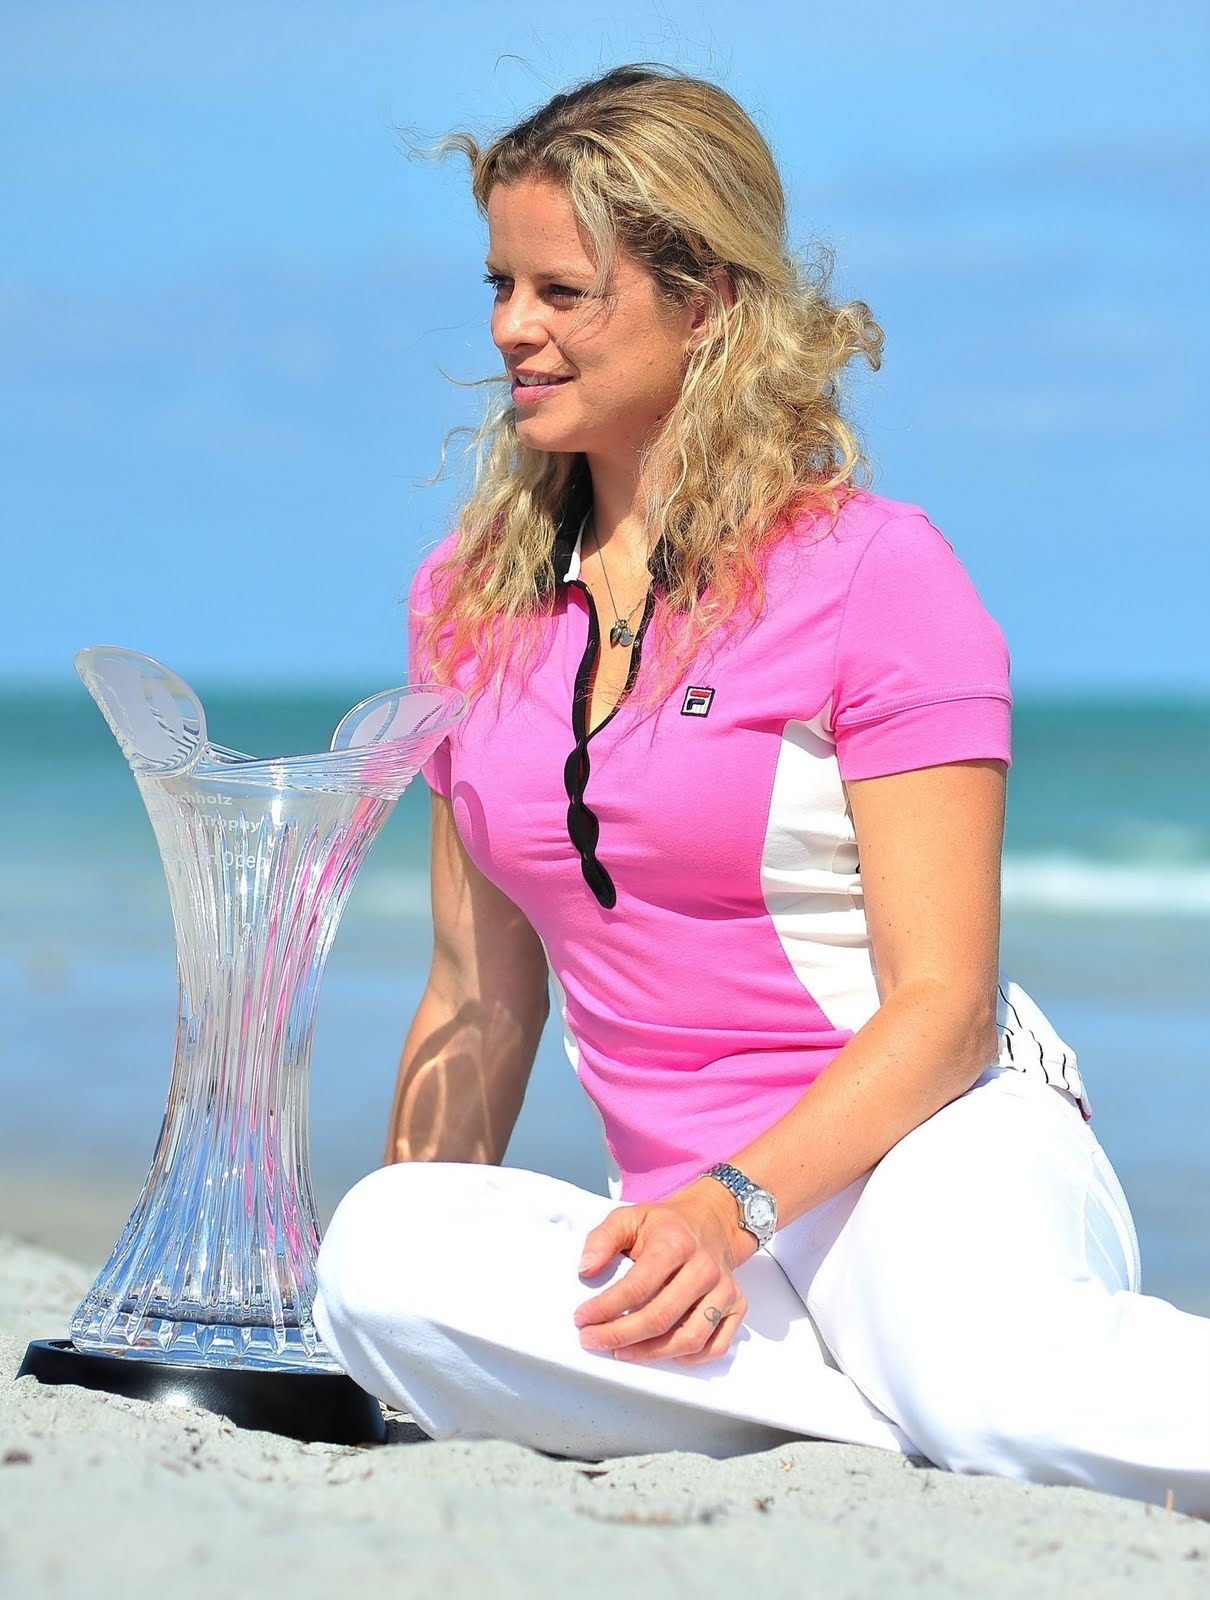 Sports Stars Celebrity Kim Clijsters Female Tennis Celebrity